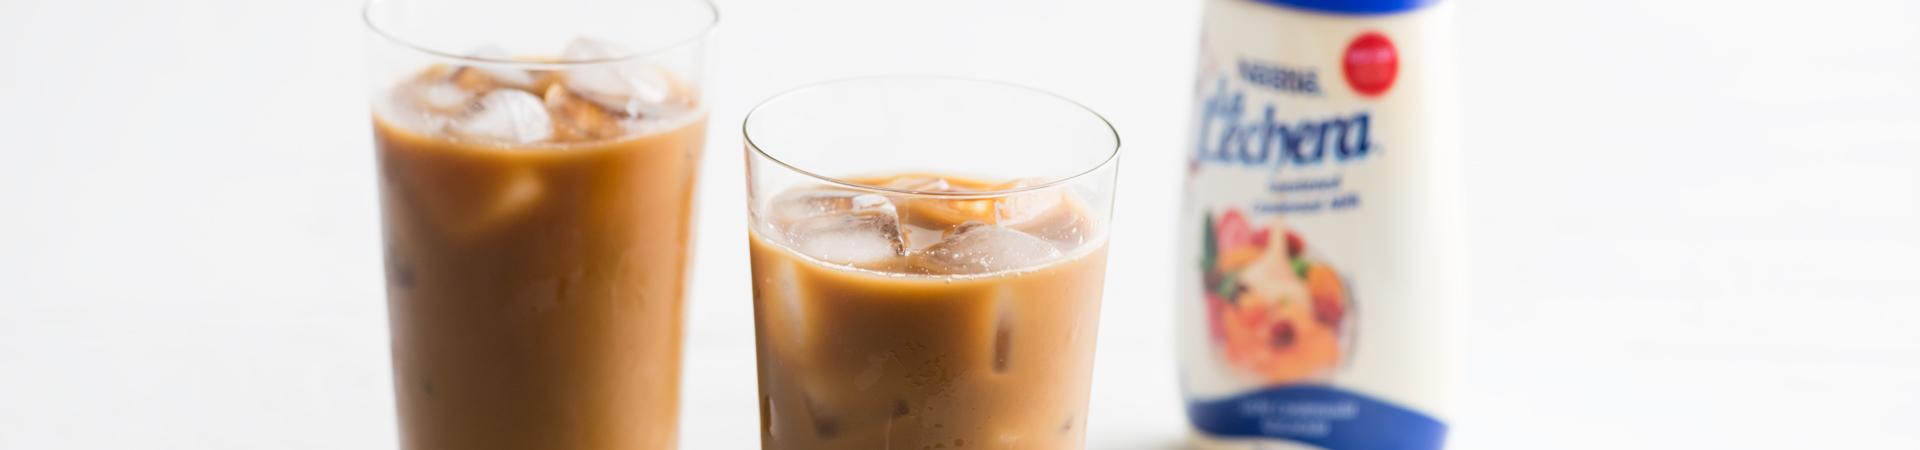 Vietnamese-Style Coffee